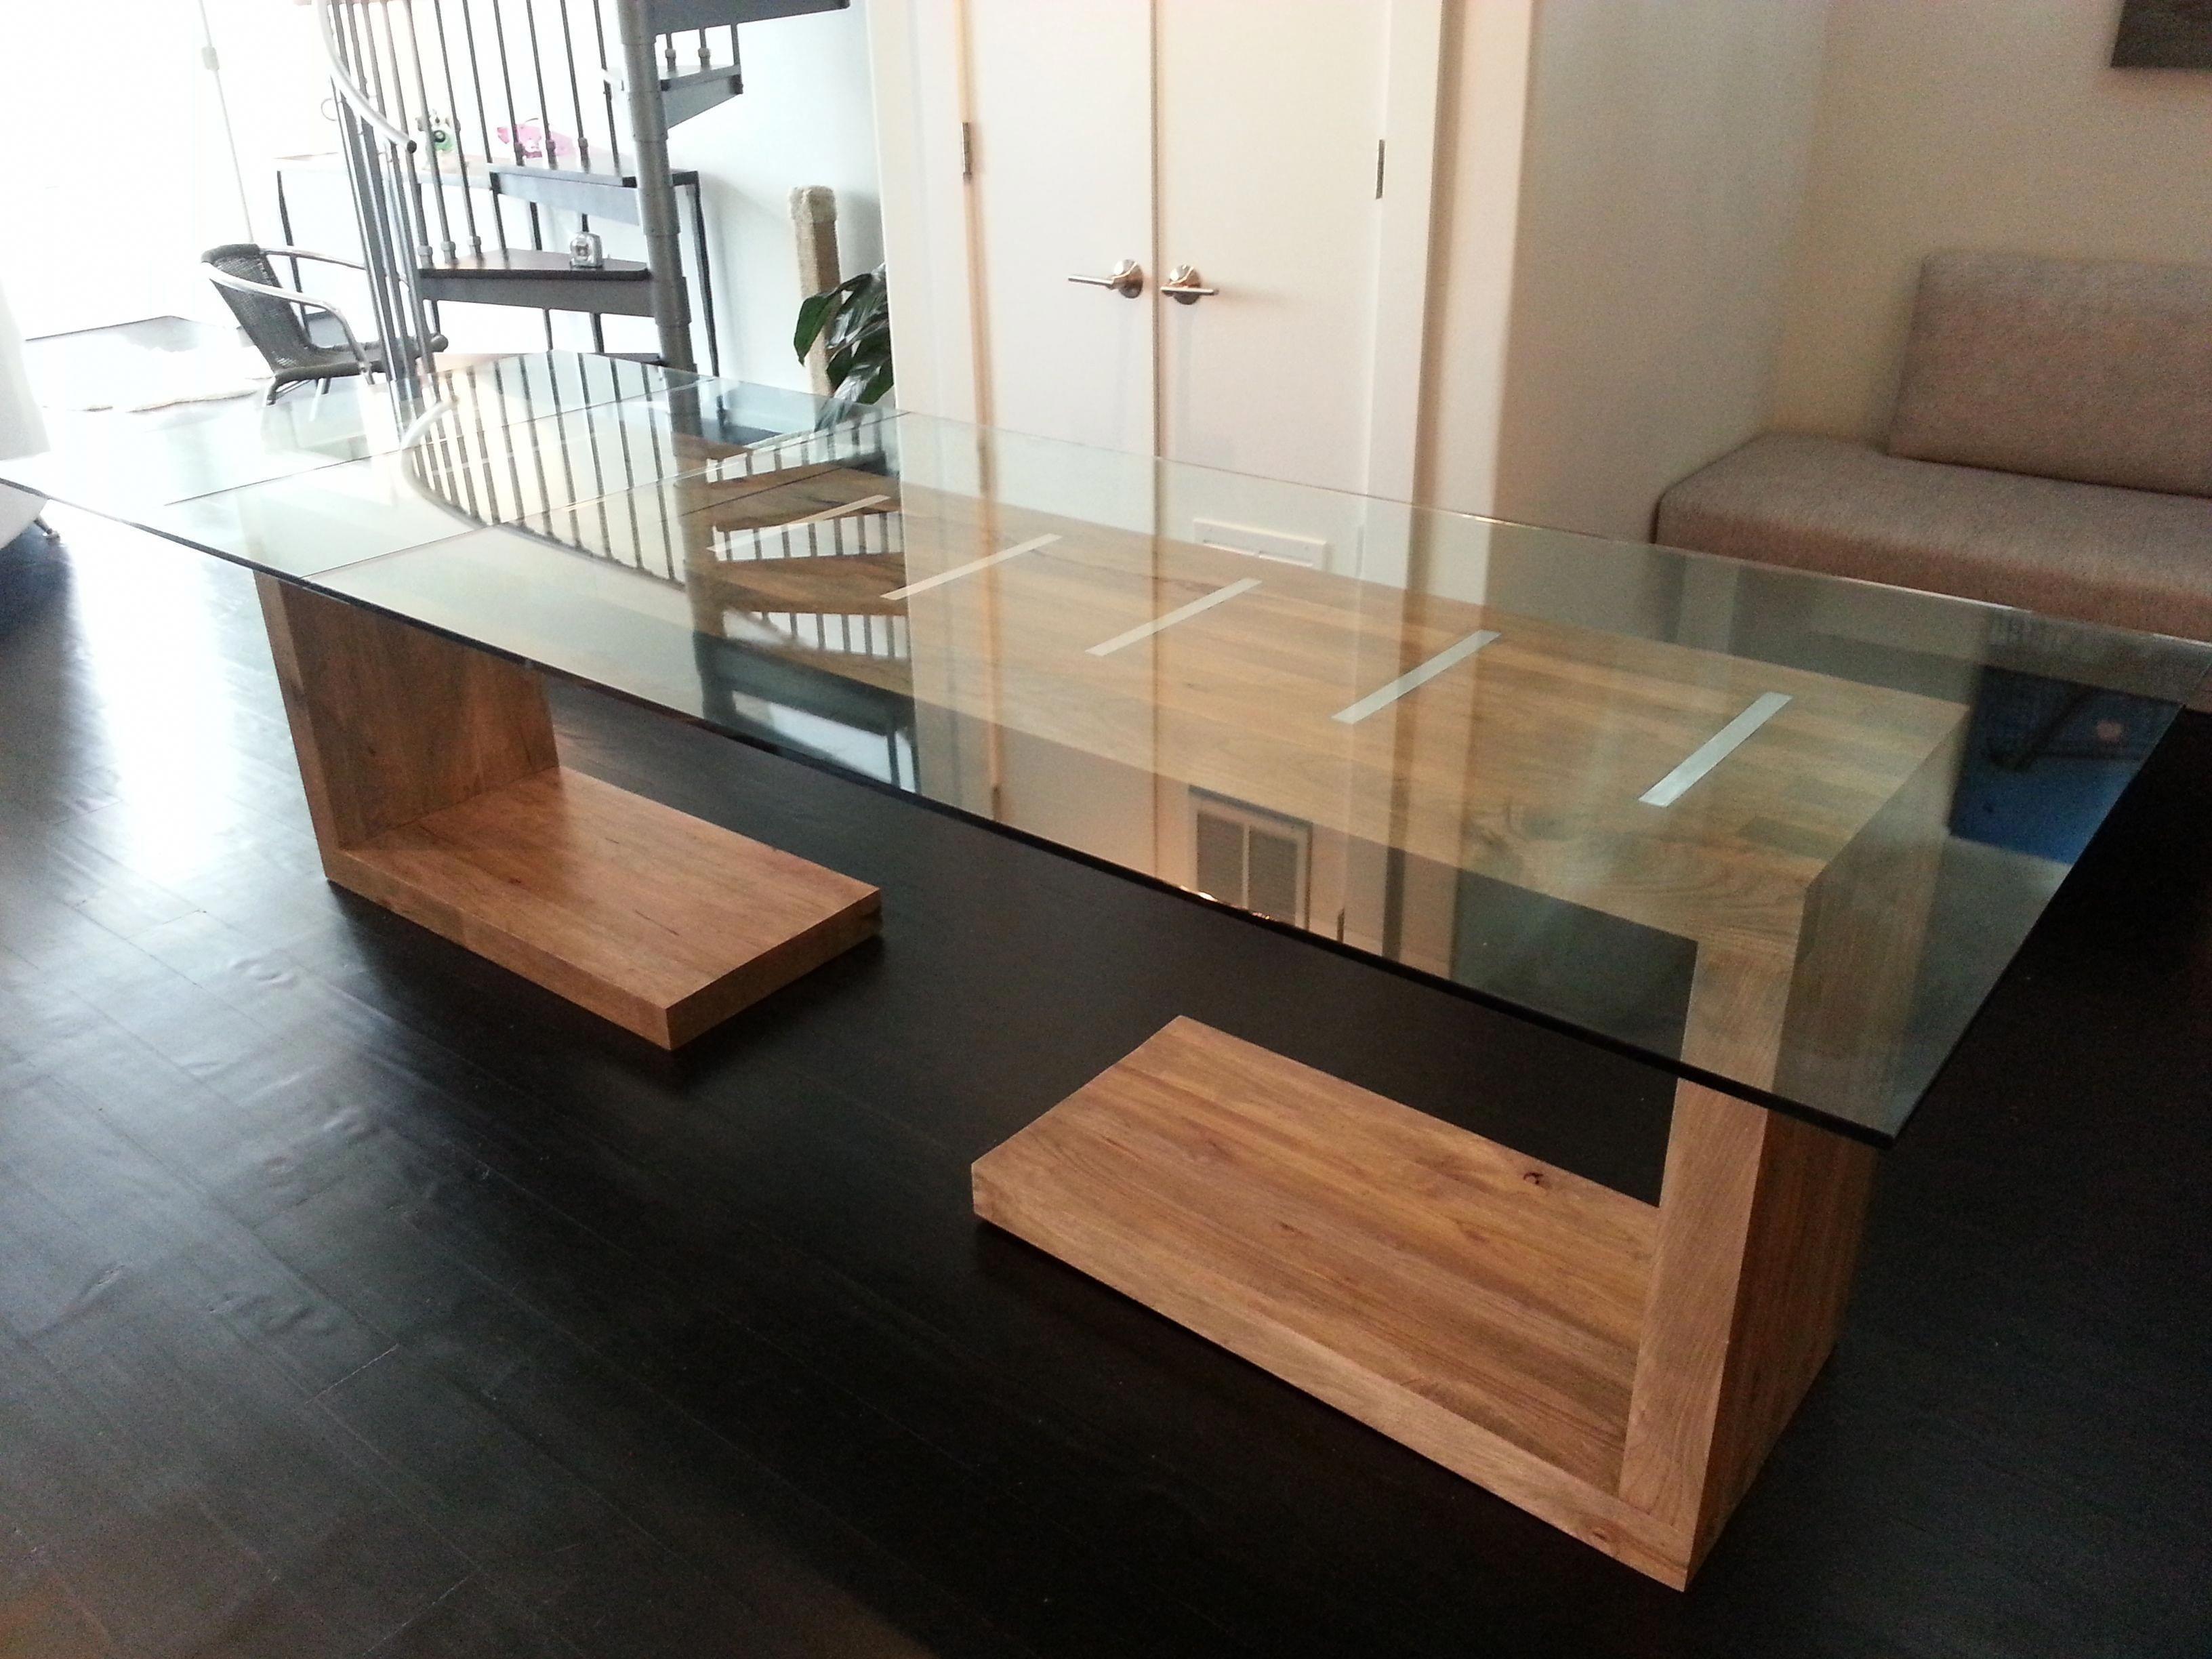 Furniture Rental Oahu European Furniture Stores Los Angeles Table